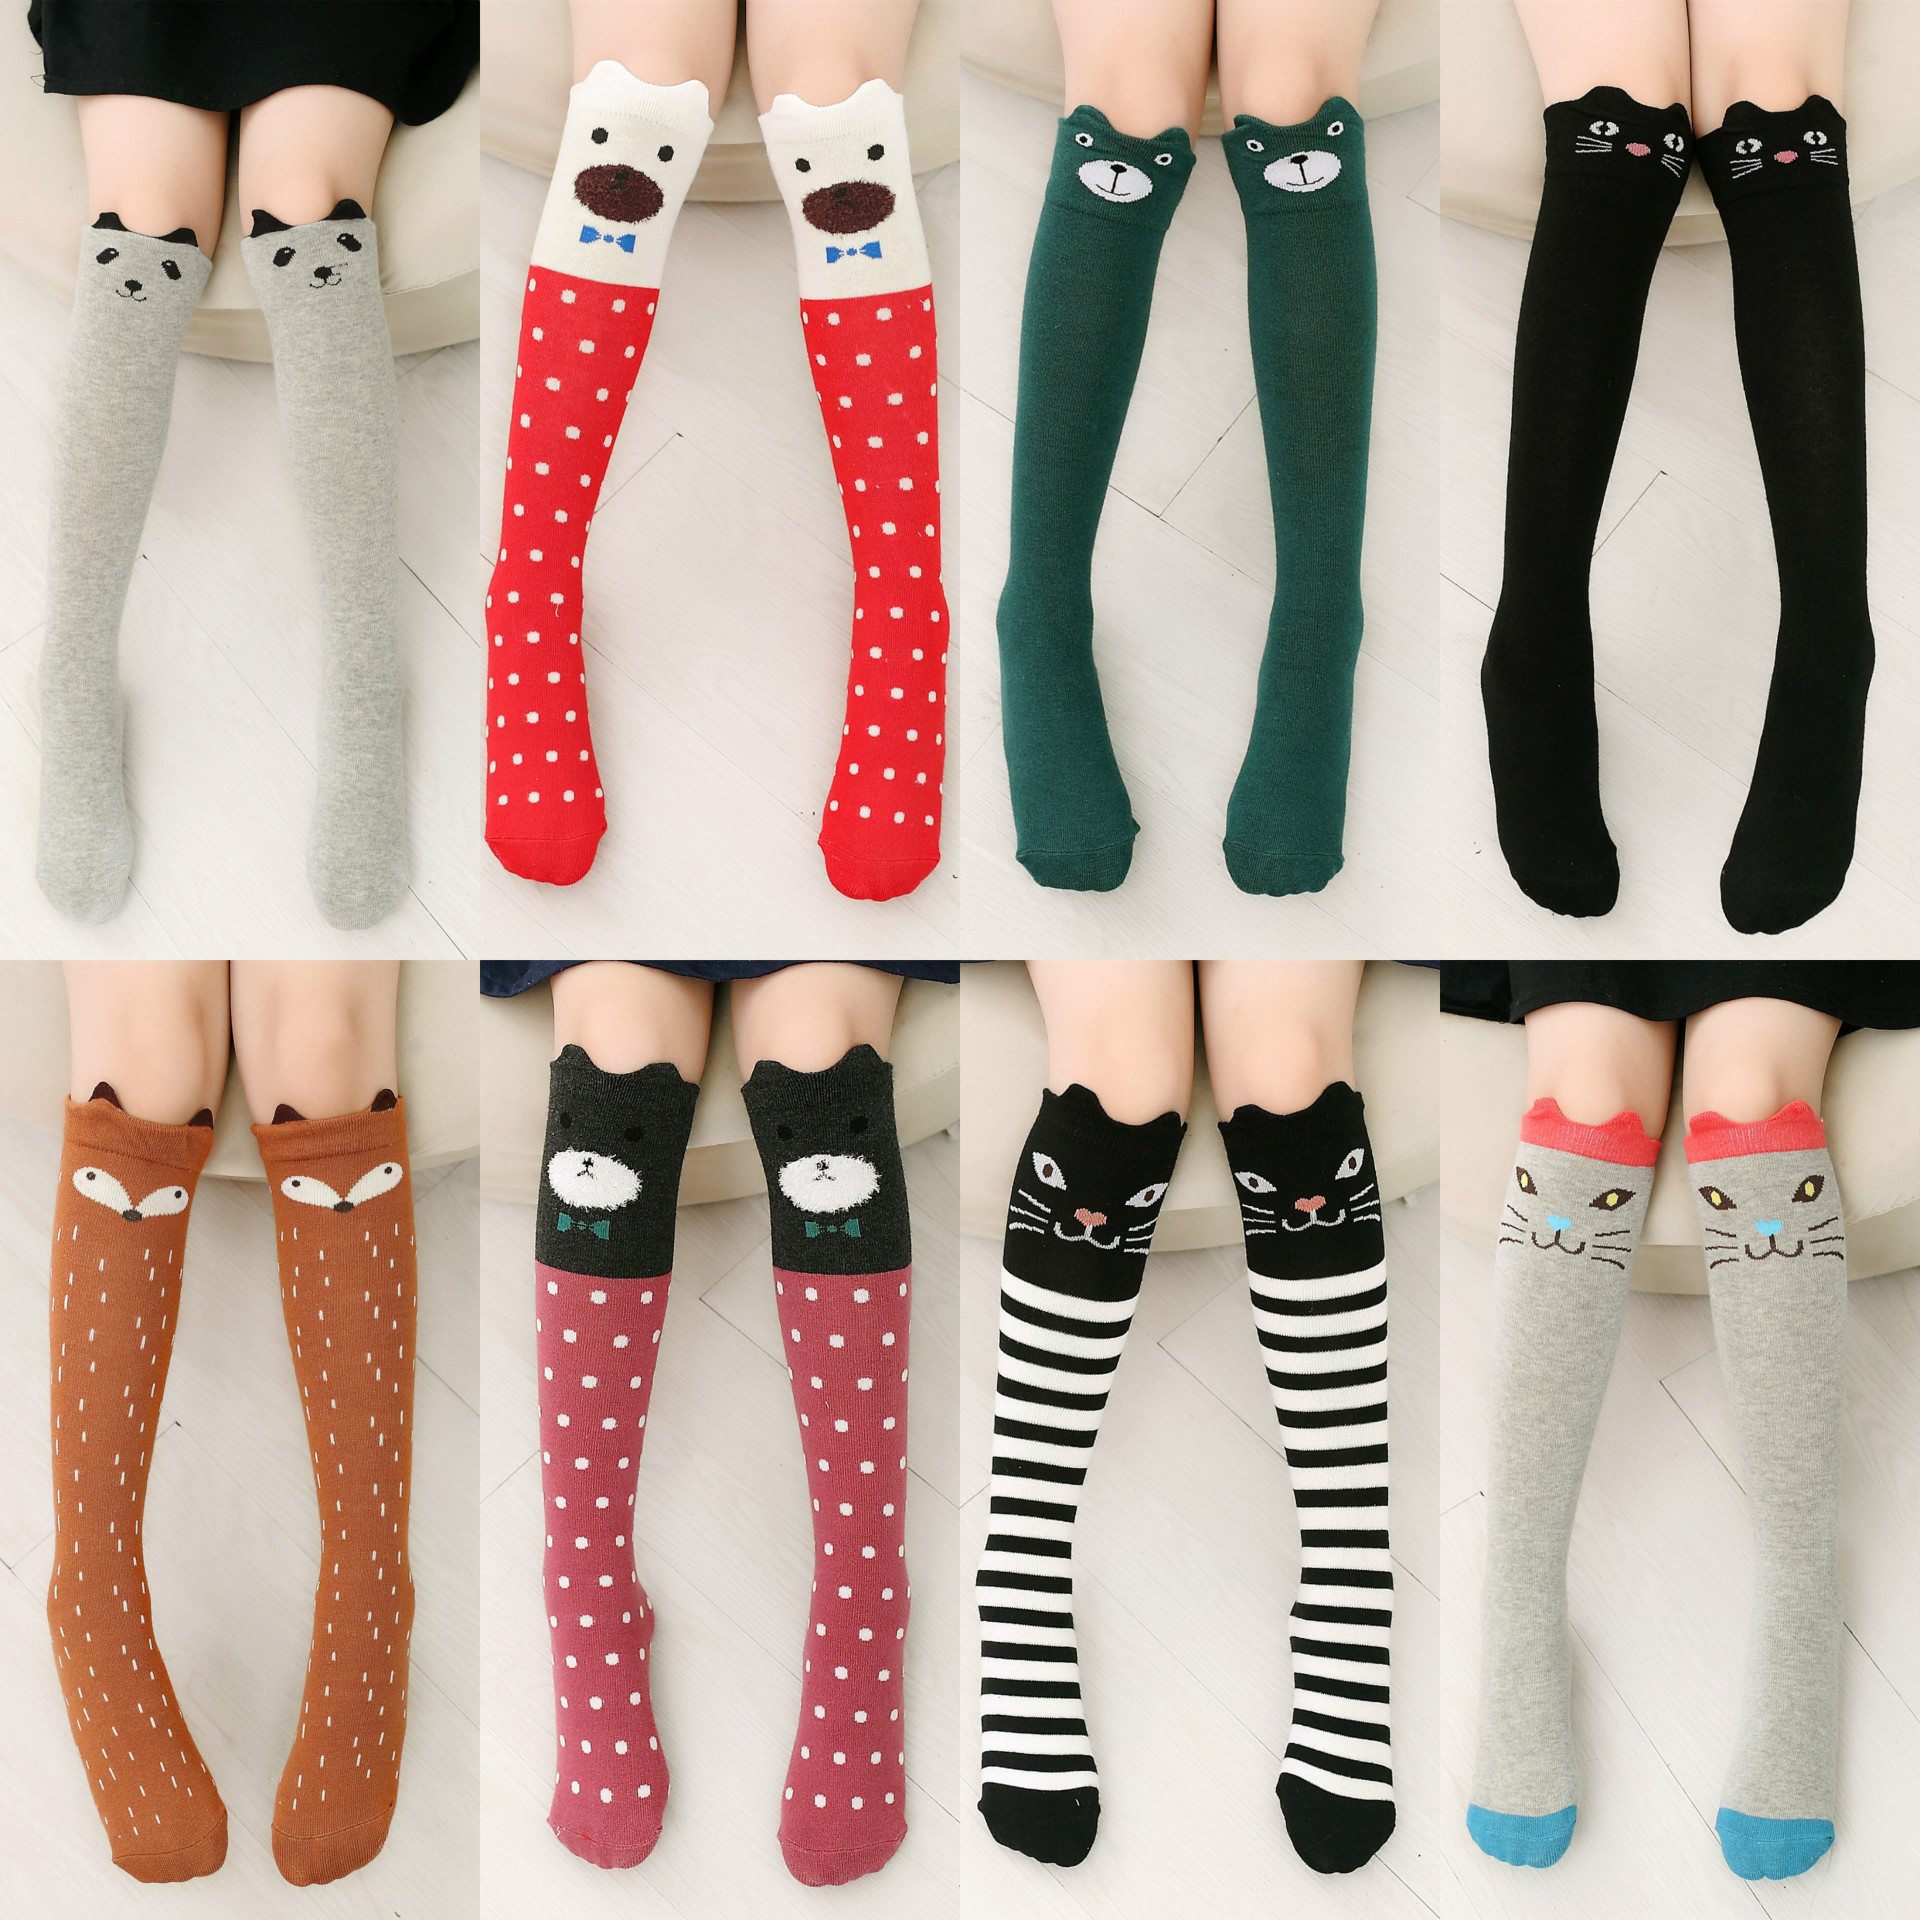 Lovely Girls Candy Color Winter Warm Leg Warmers Polka Dot Cotton High Leg Socks